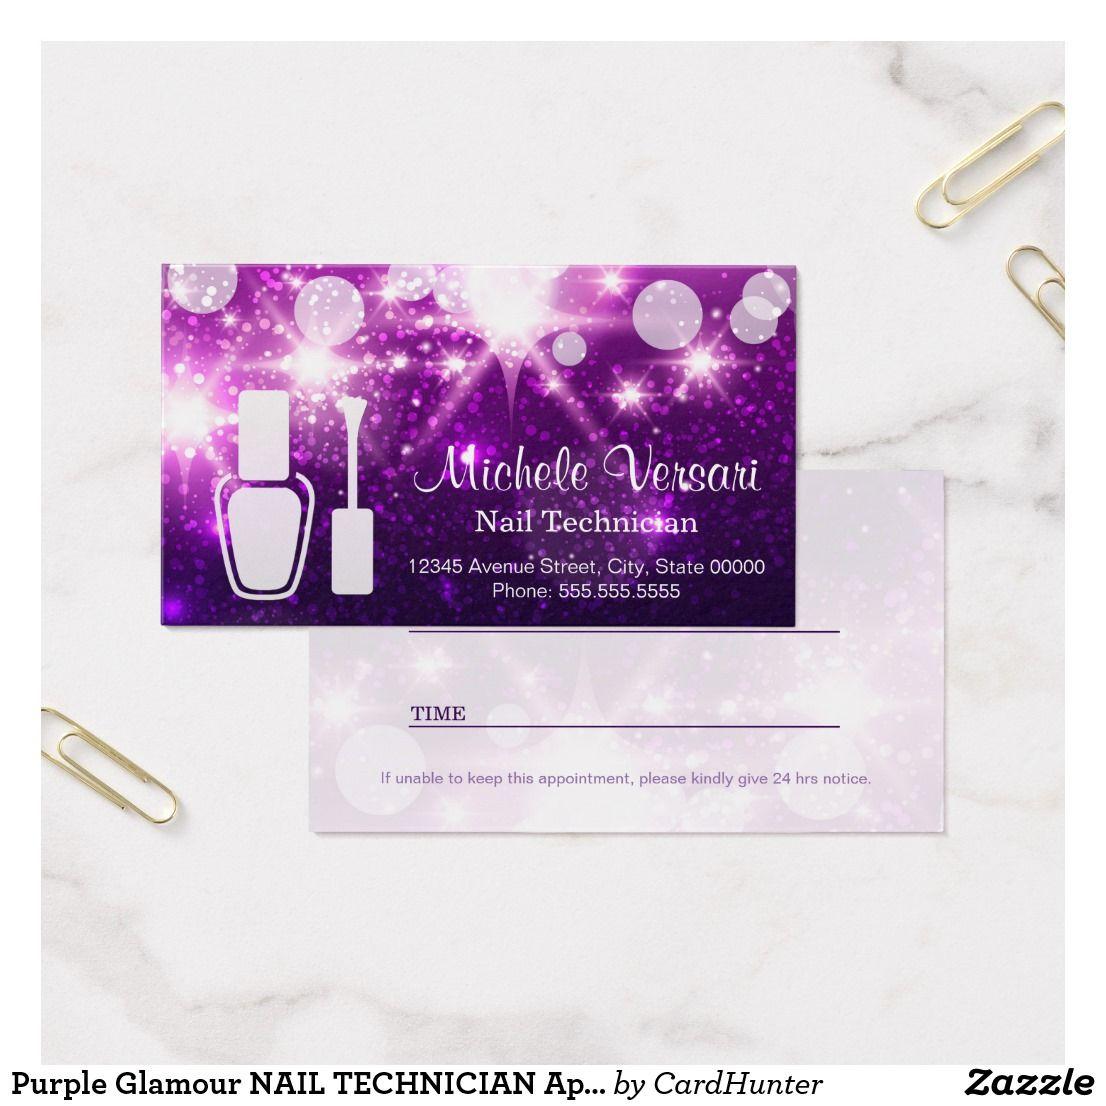 Purple Glamour NAIL TECHNICIAN Appointment Card Zazzle